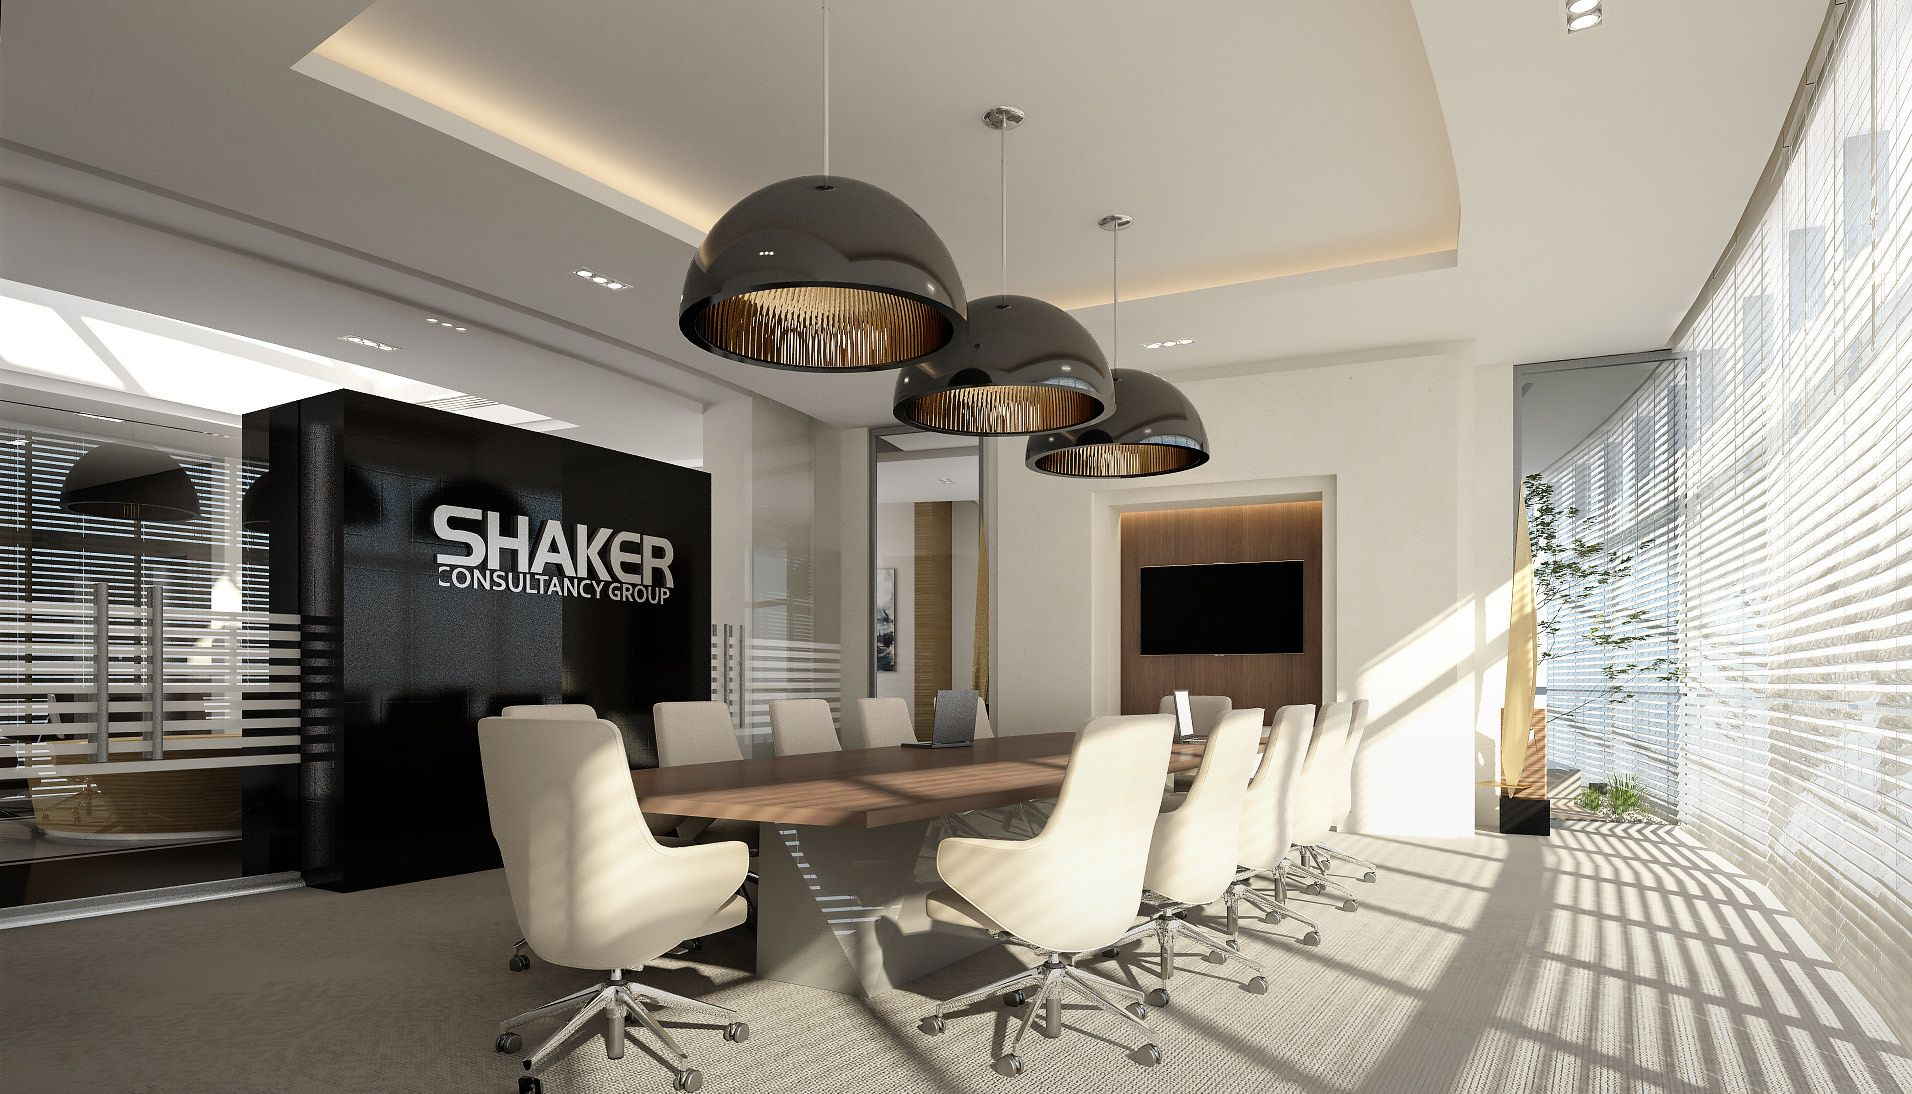 Mimar interiors dise o de interiores pinterest for Despachos de diseno de interiores df